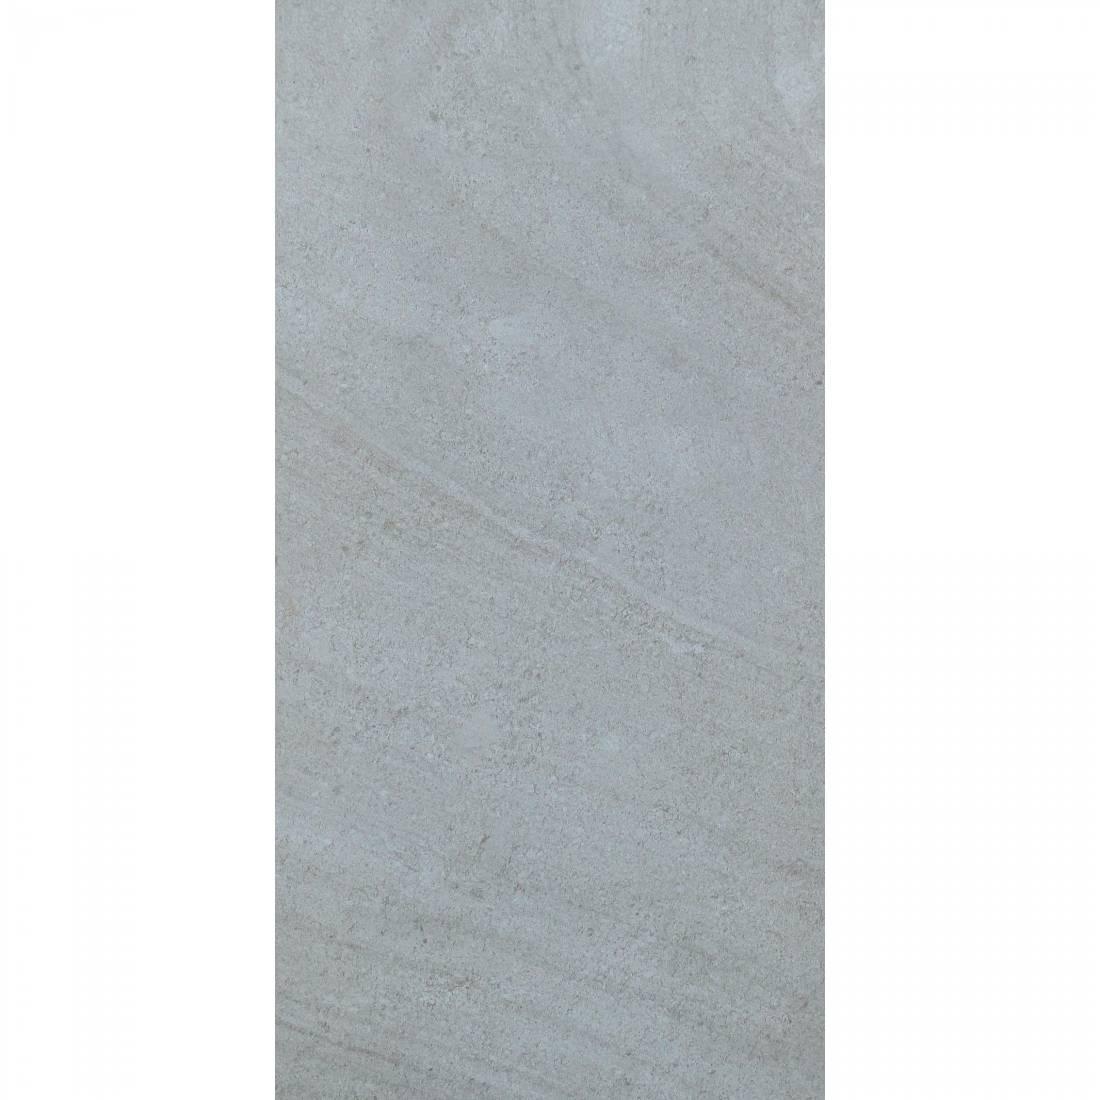 Dune 30x60 Grey Matt 1